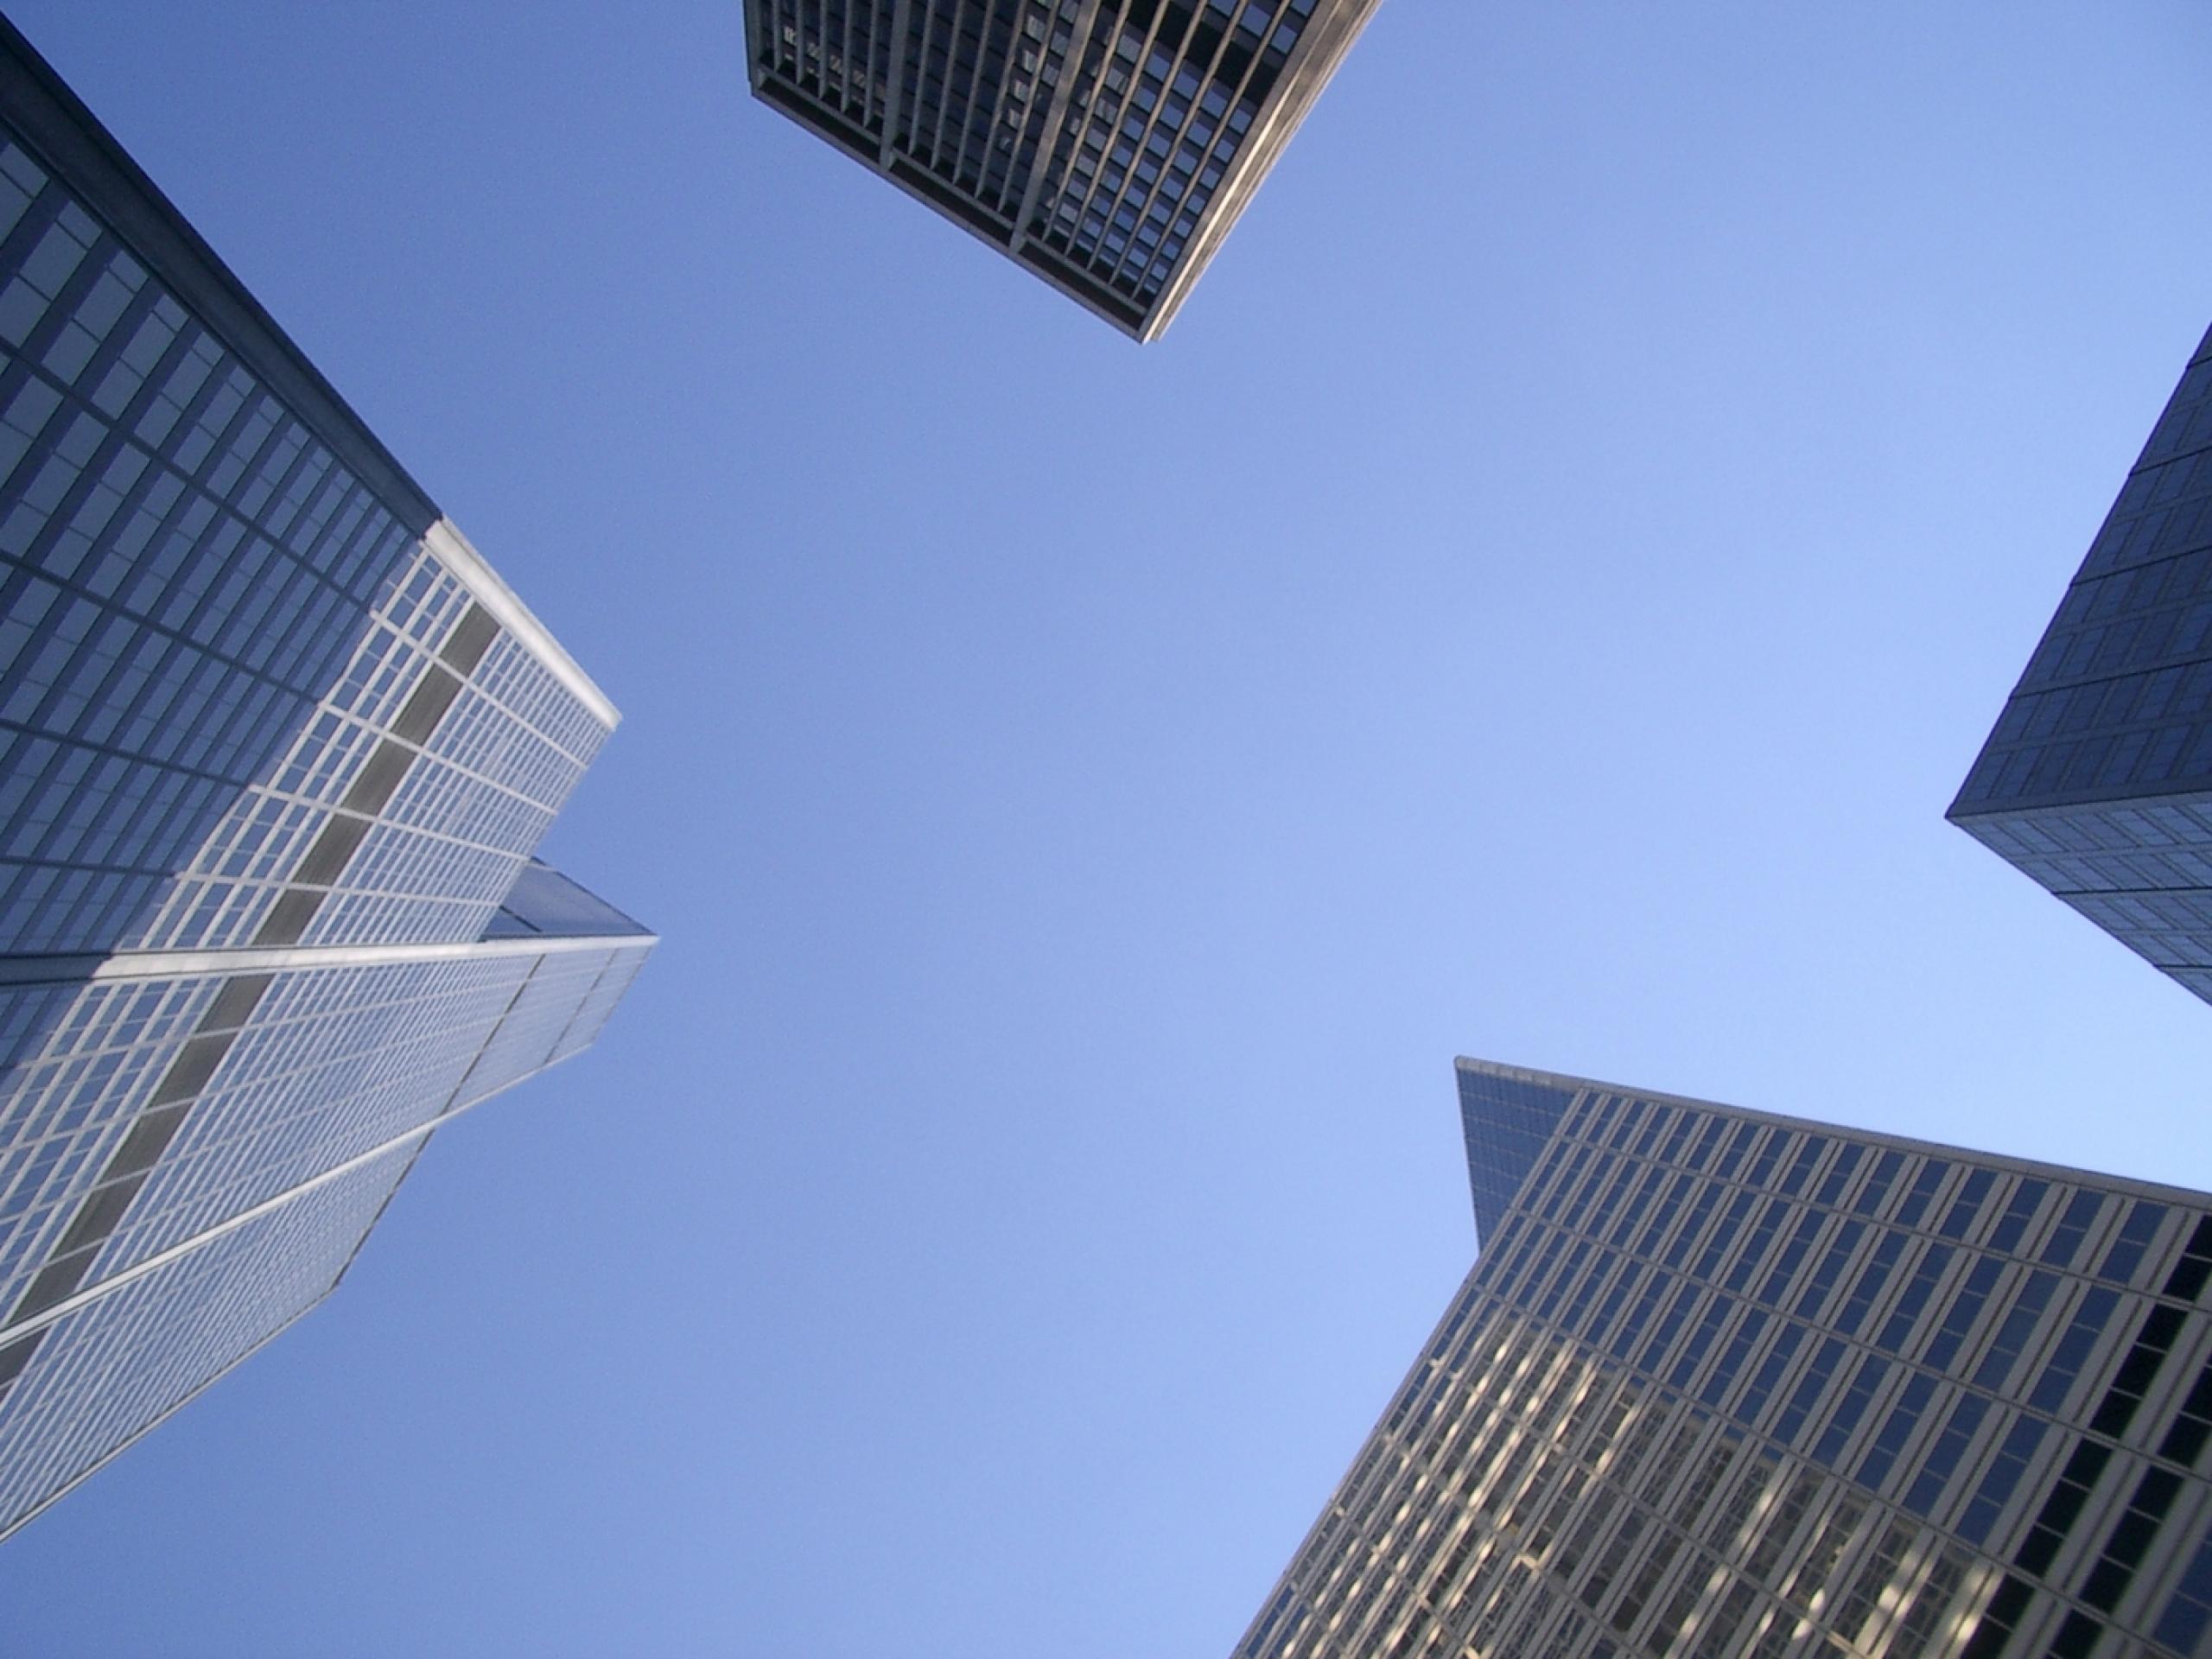 Rascacielos Fondo De Pantalla HD